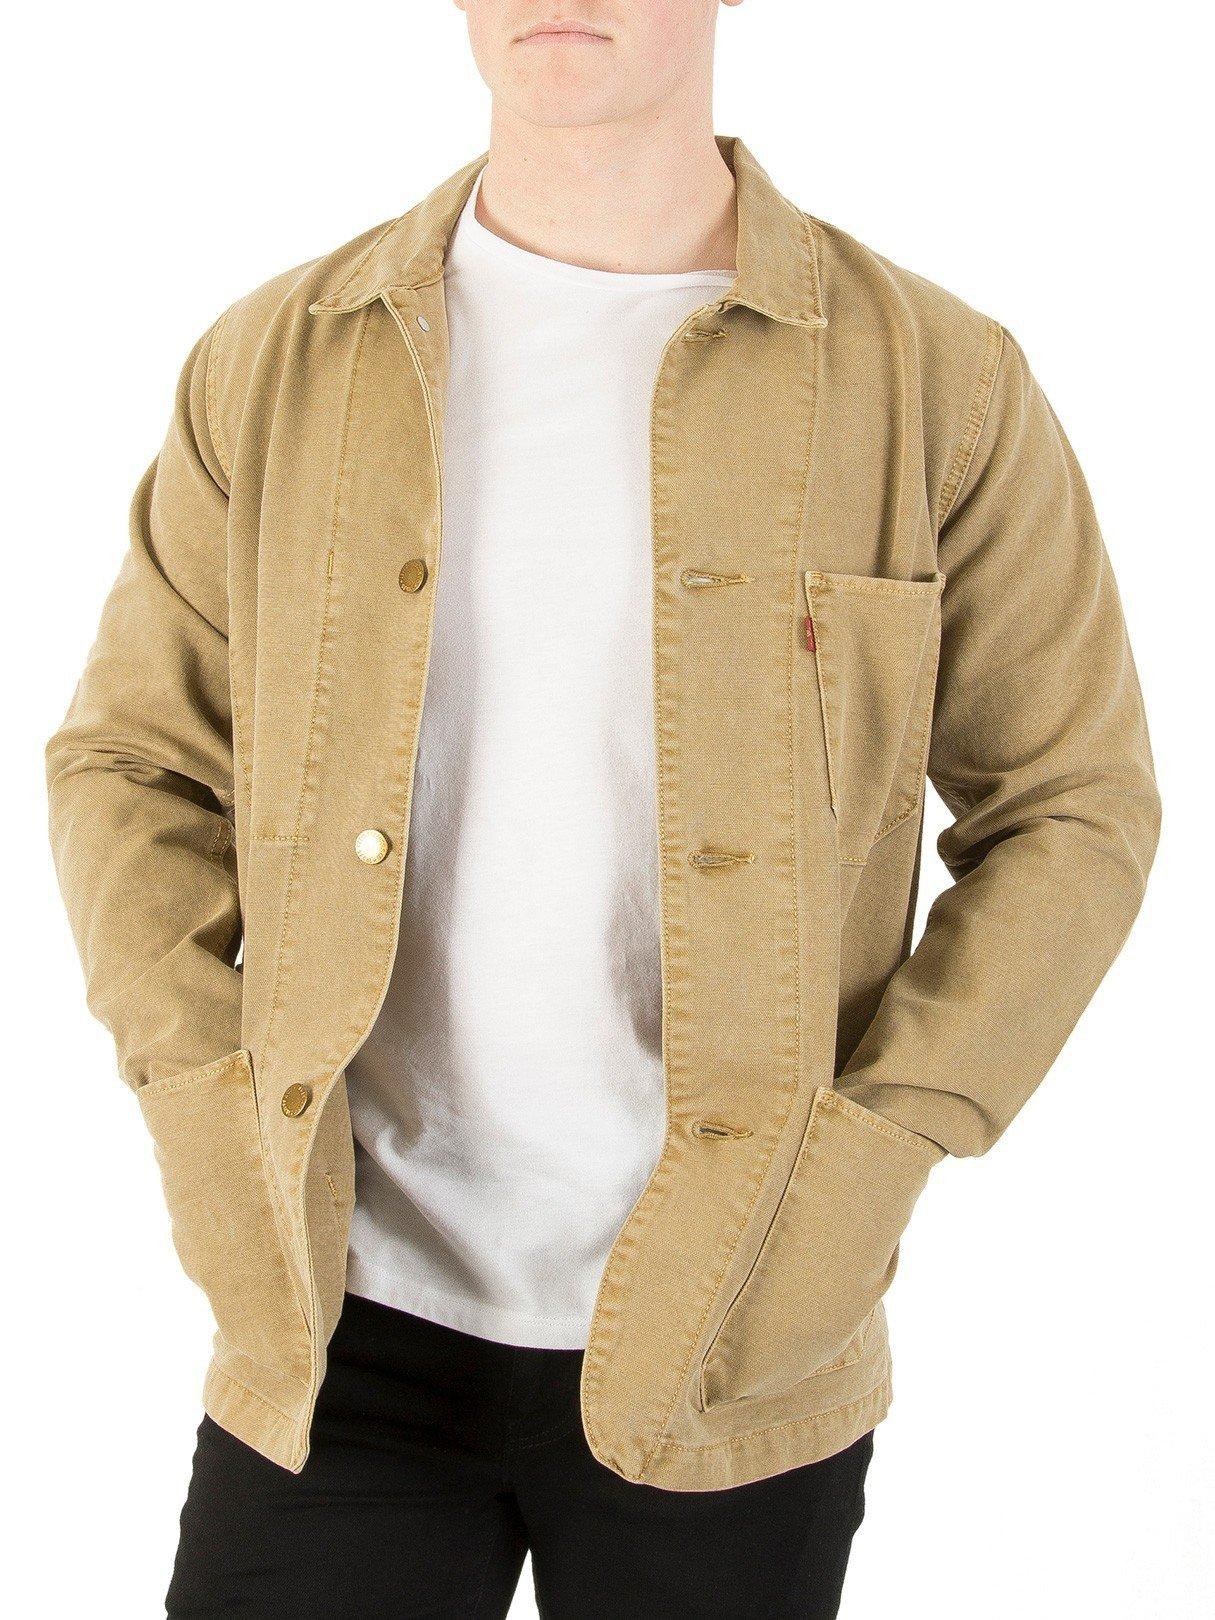 Levi's Levis Engineers Coat 20 Jacket Small Harvest Gold